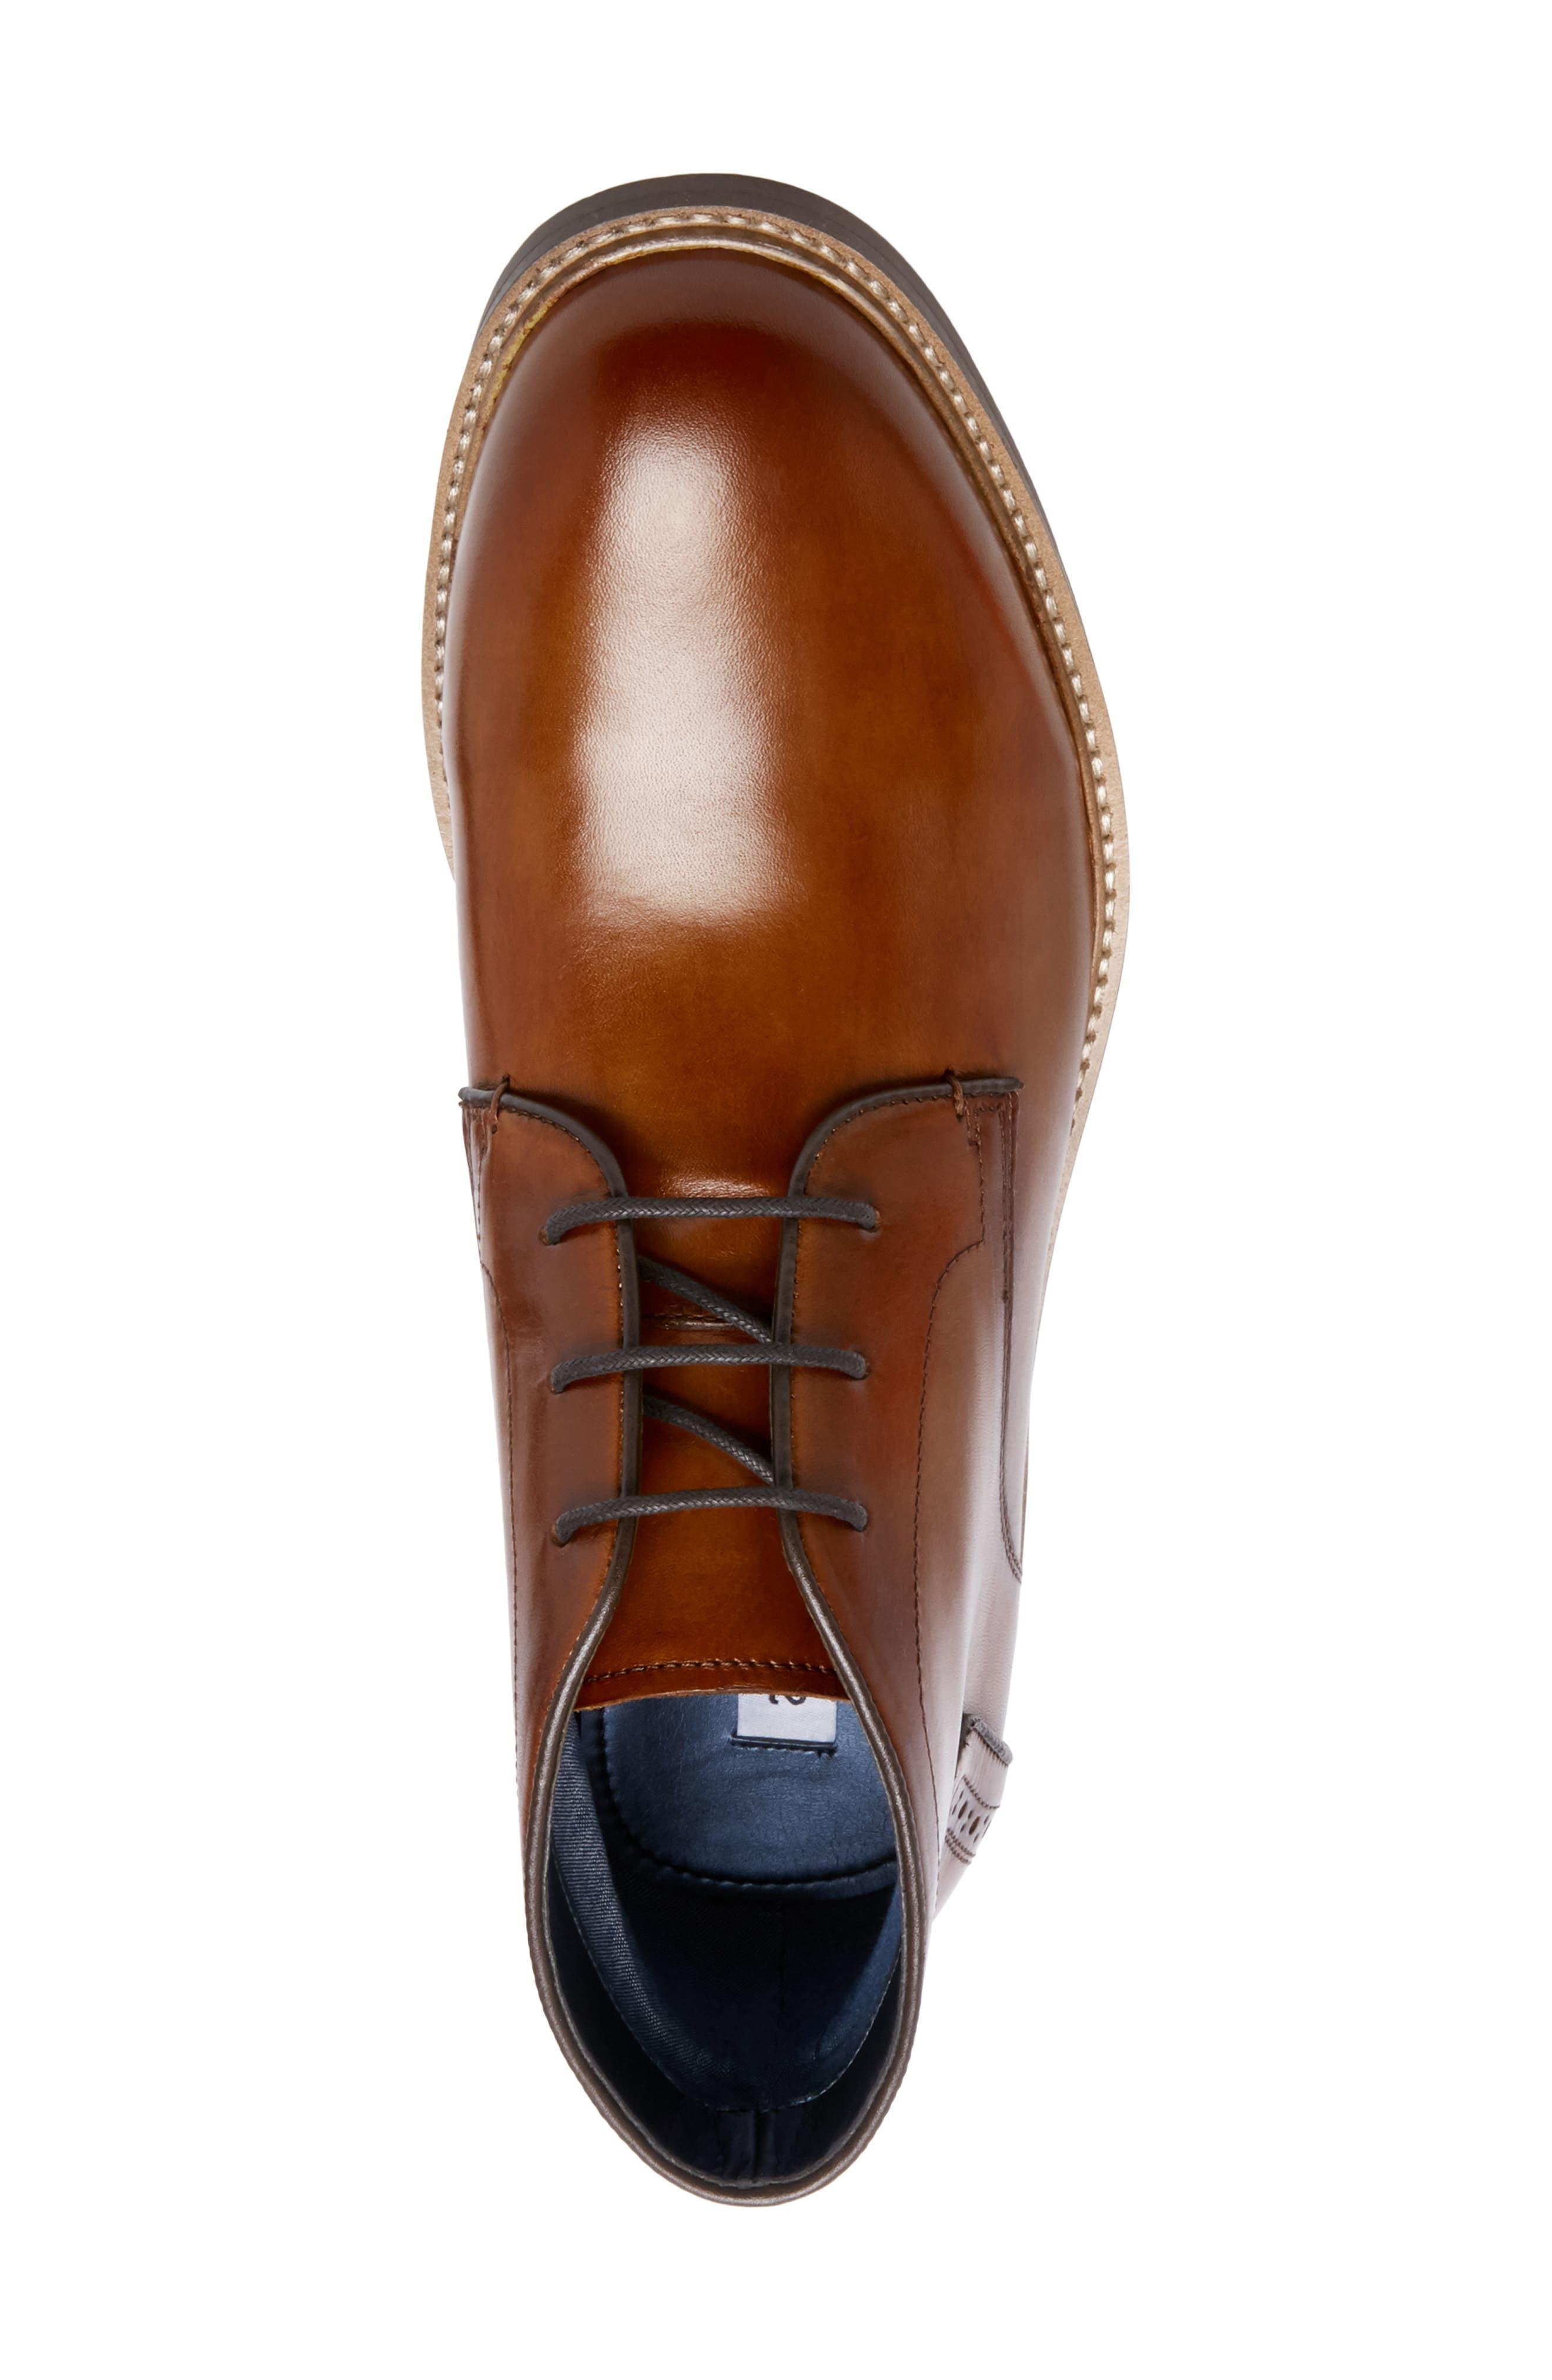 Backster Plain Toe Chukka Boot,                             Alternate thumbnail 5, color,                             COGNAC LEATHER